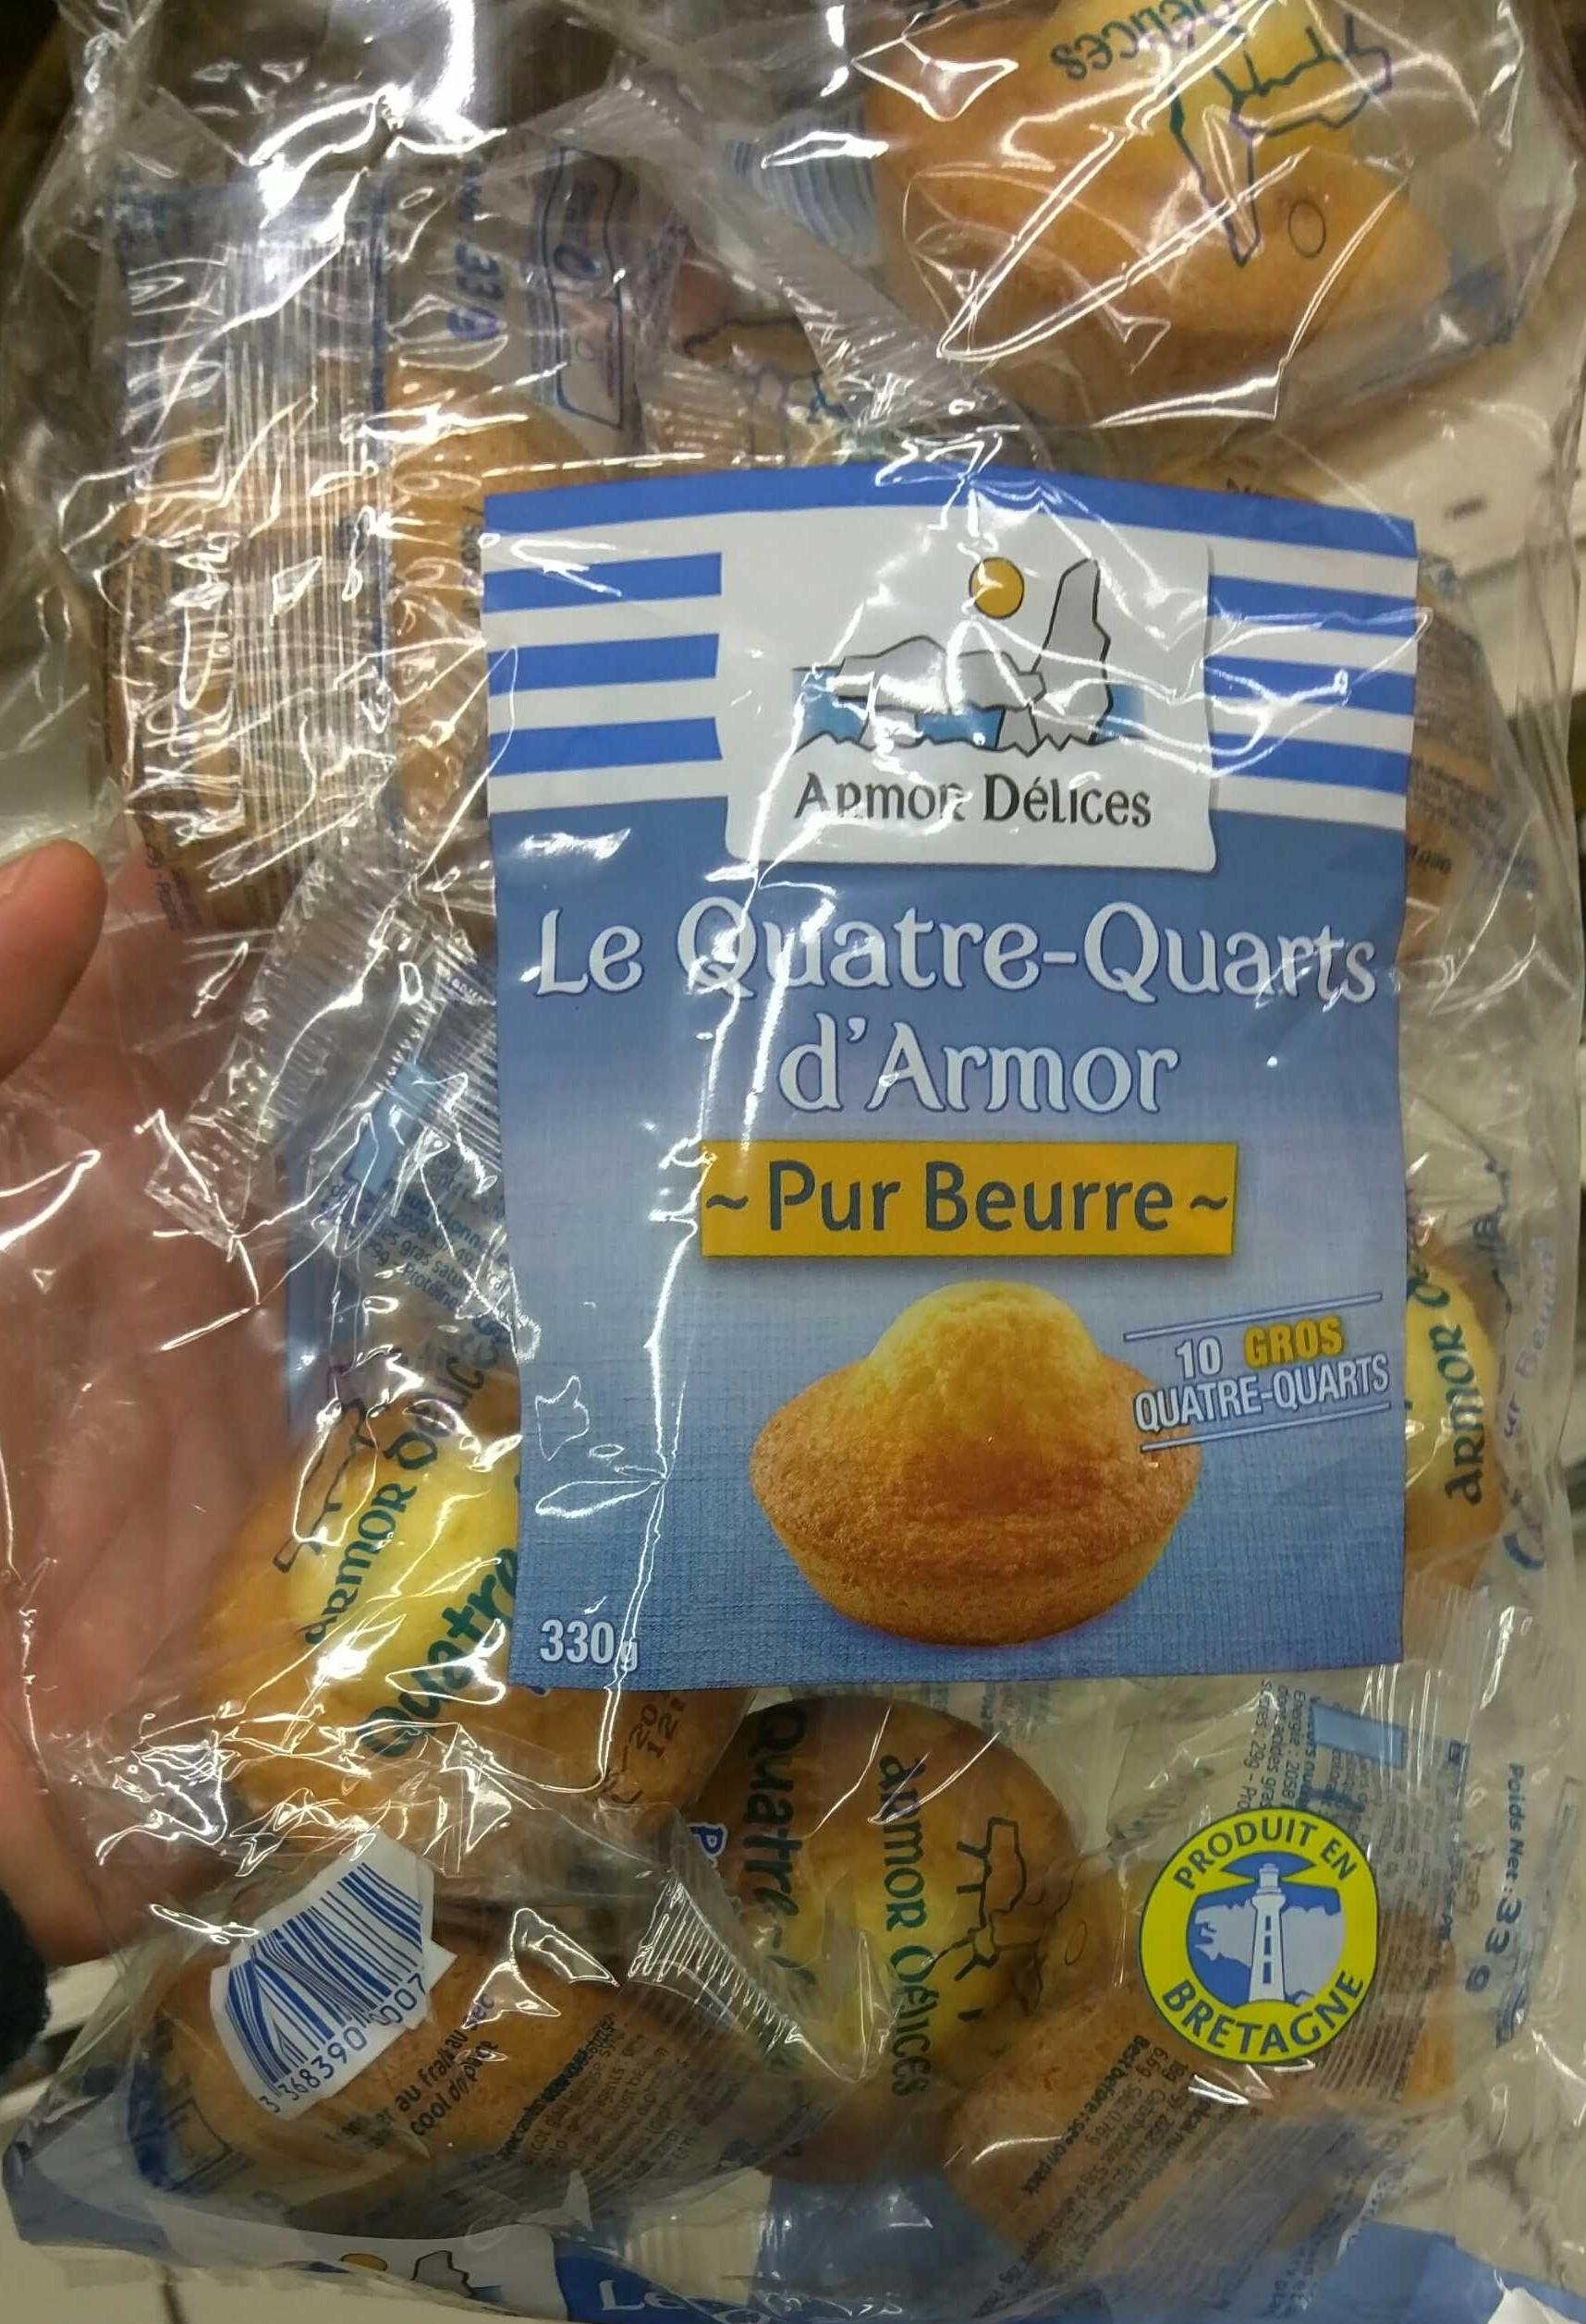 Le Quatre Quarts d'Armor Pur Beurre - Product - fr